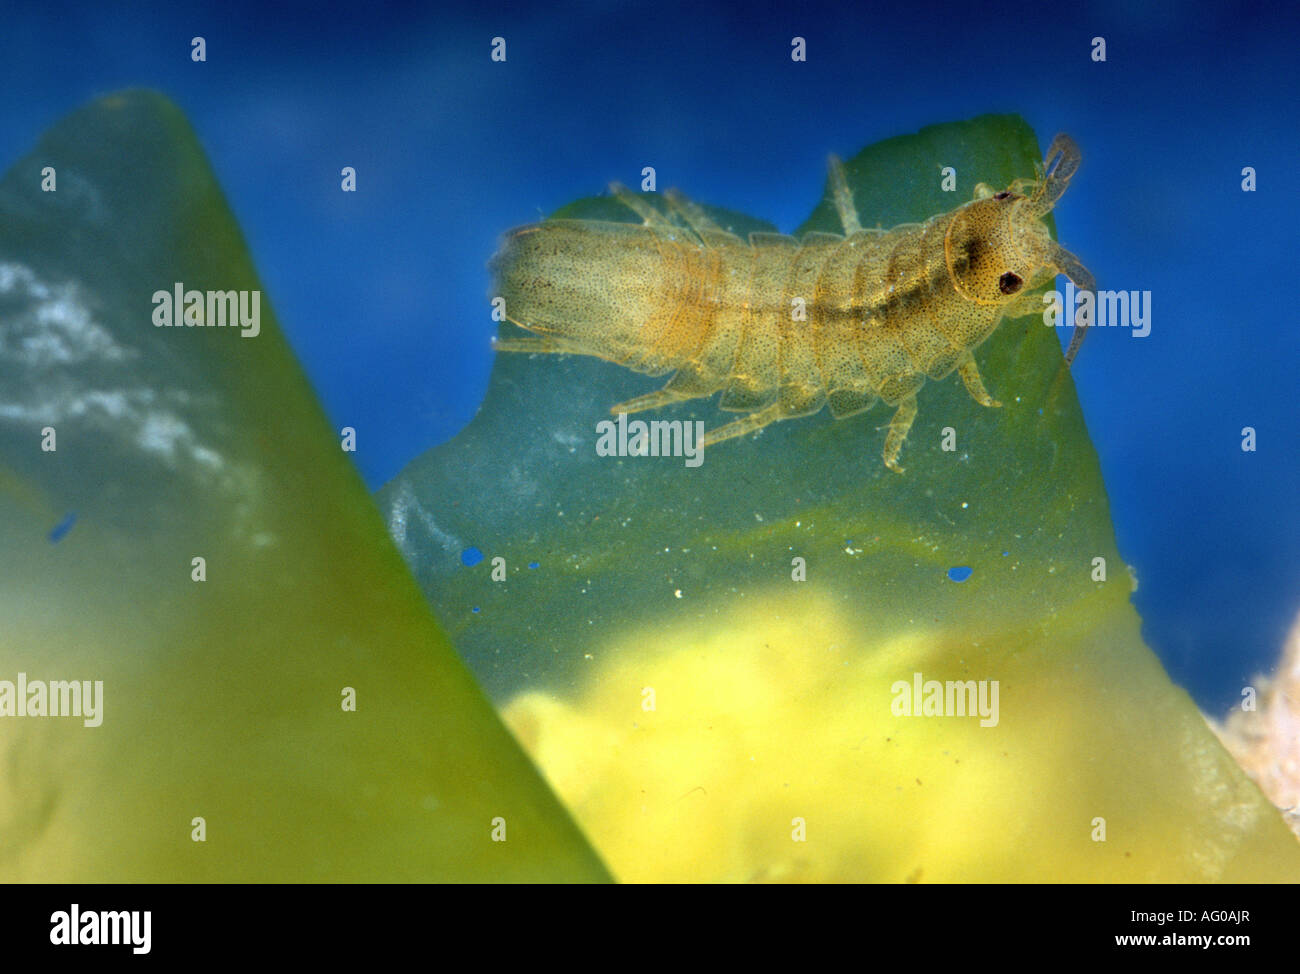 Amphipod Orchestia sp on seaweed Mediterranean - Stock Image